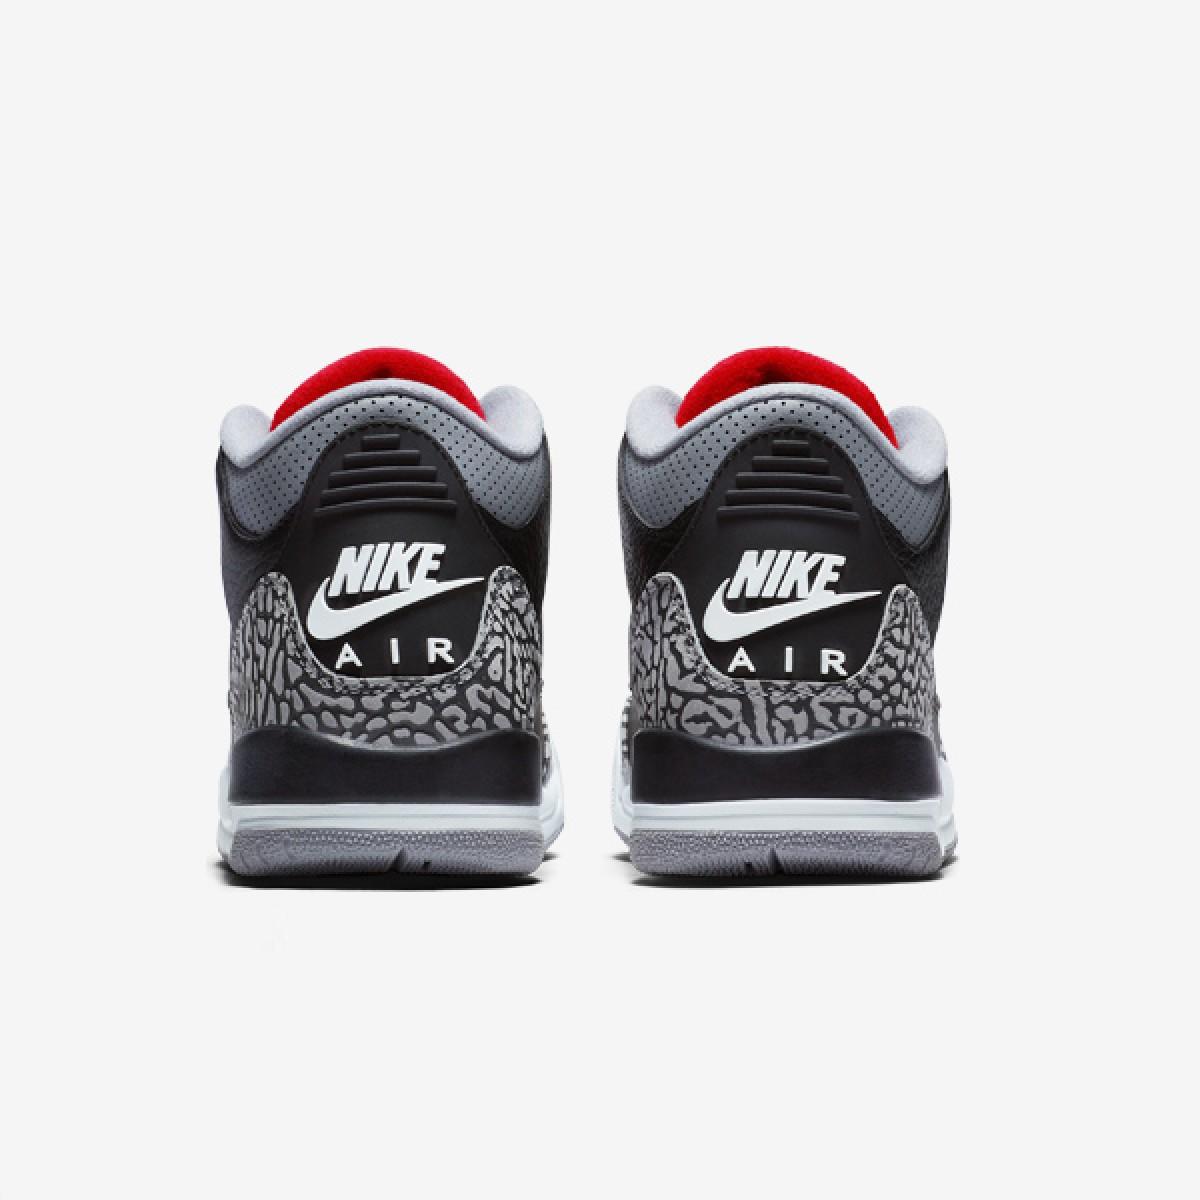 Air Jordan 3 Retro Gs 'Black Cement' 854261-001